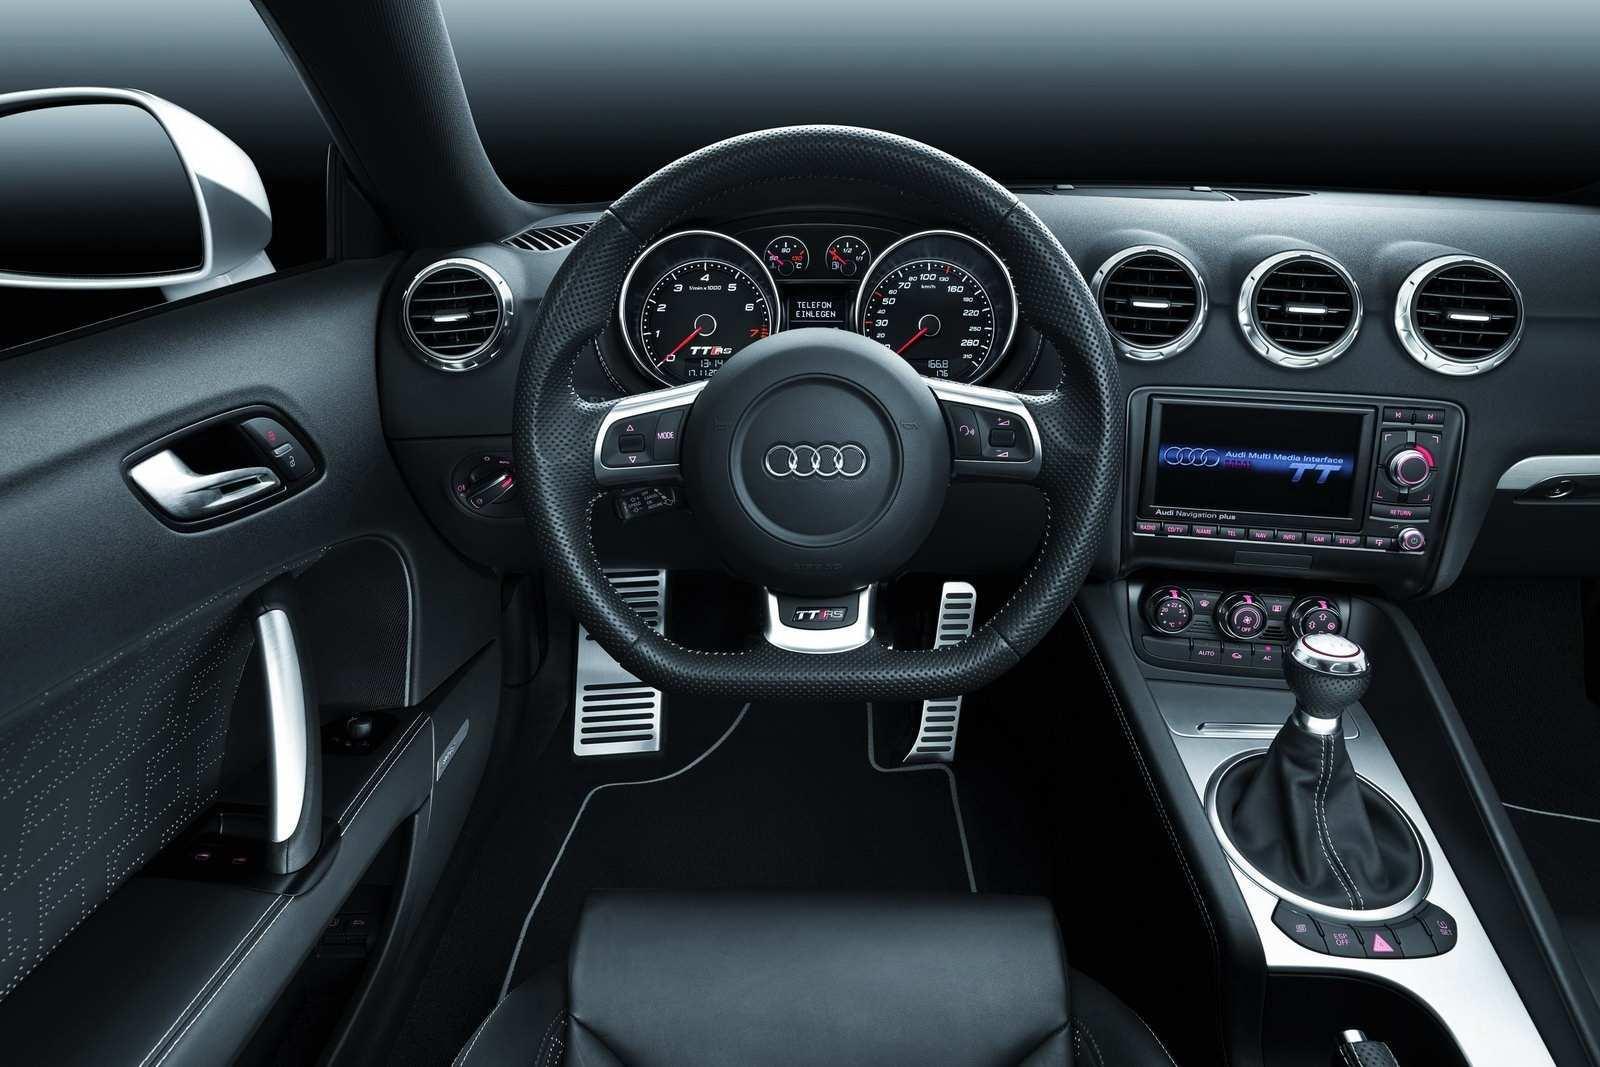 88 The Audi Tt 2020 Interior Research New for Audi Tt 2020 Interior